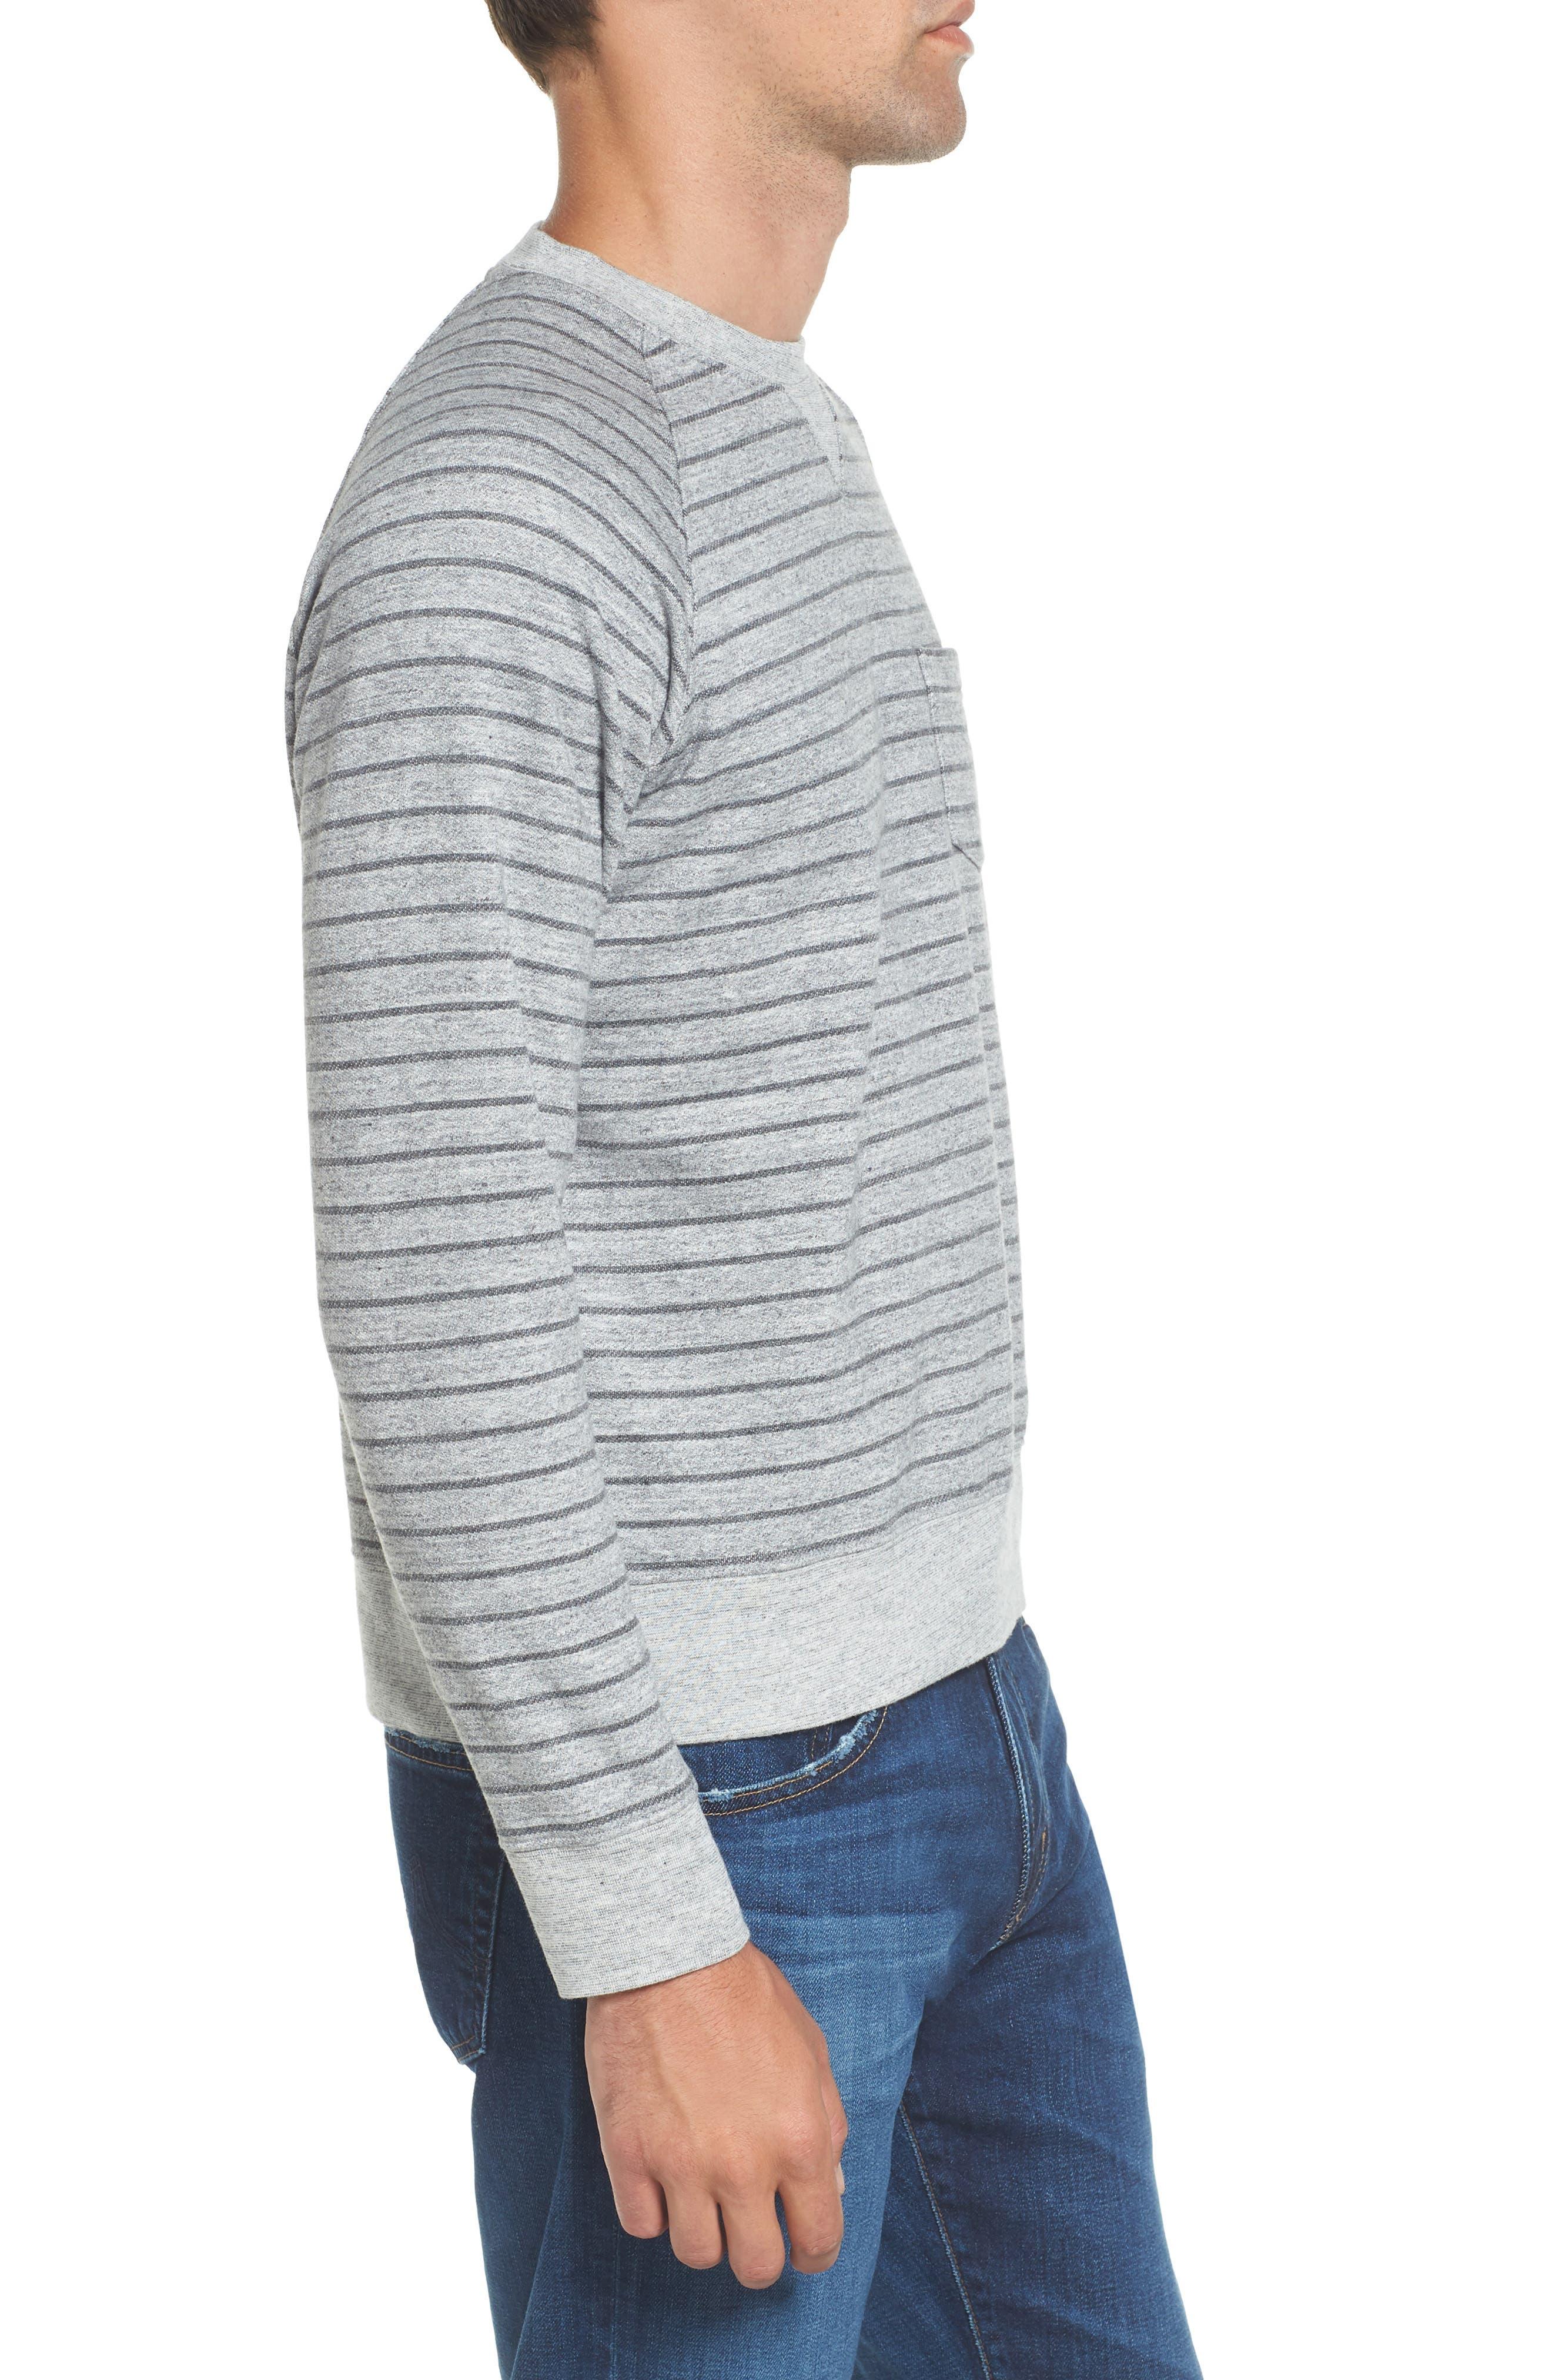 Palmer Modern Fit Athletic Stripe Sweatshirt,                             Alternate thumbnail 5, color,                             Gray Heather / Charcoal